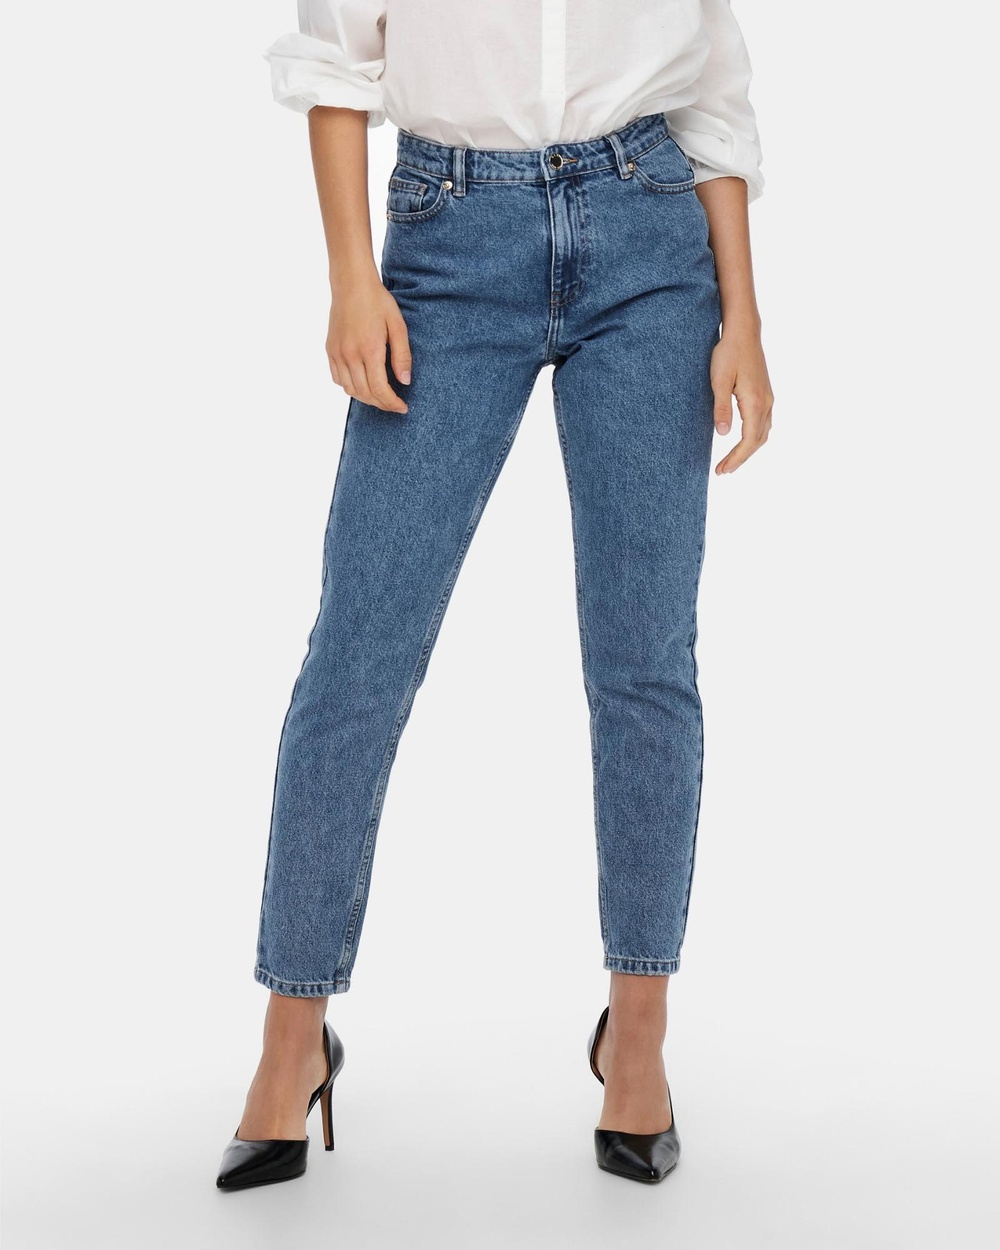 ONLY Jagger High Mom Ankle Jeans High-Waisted Medium Blue Denim Australia